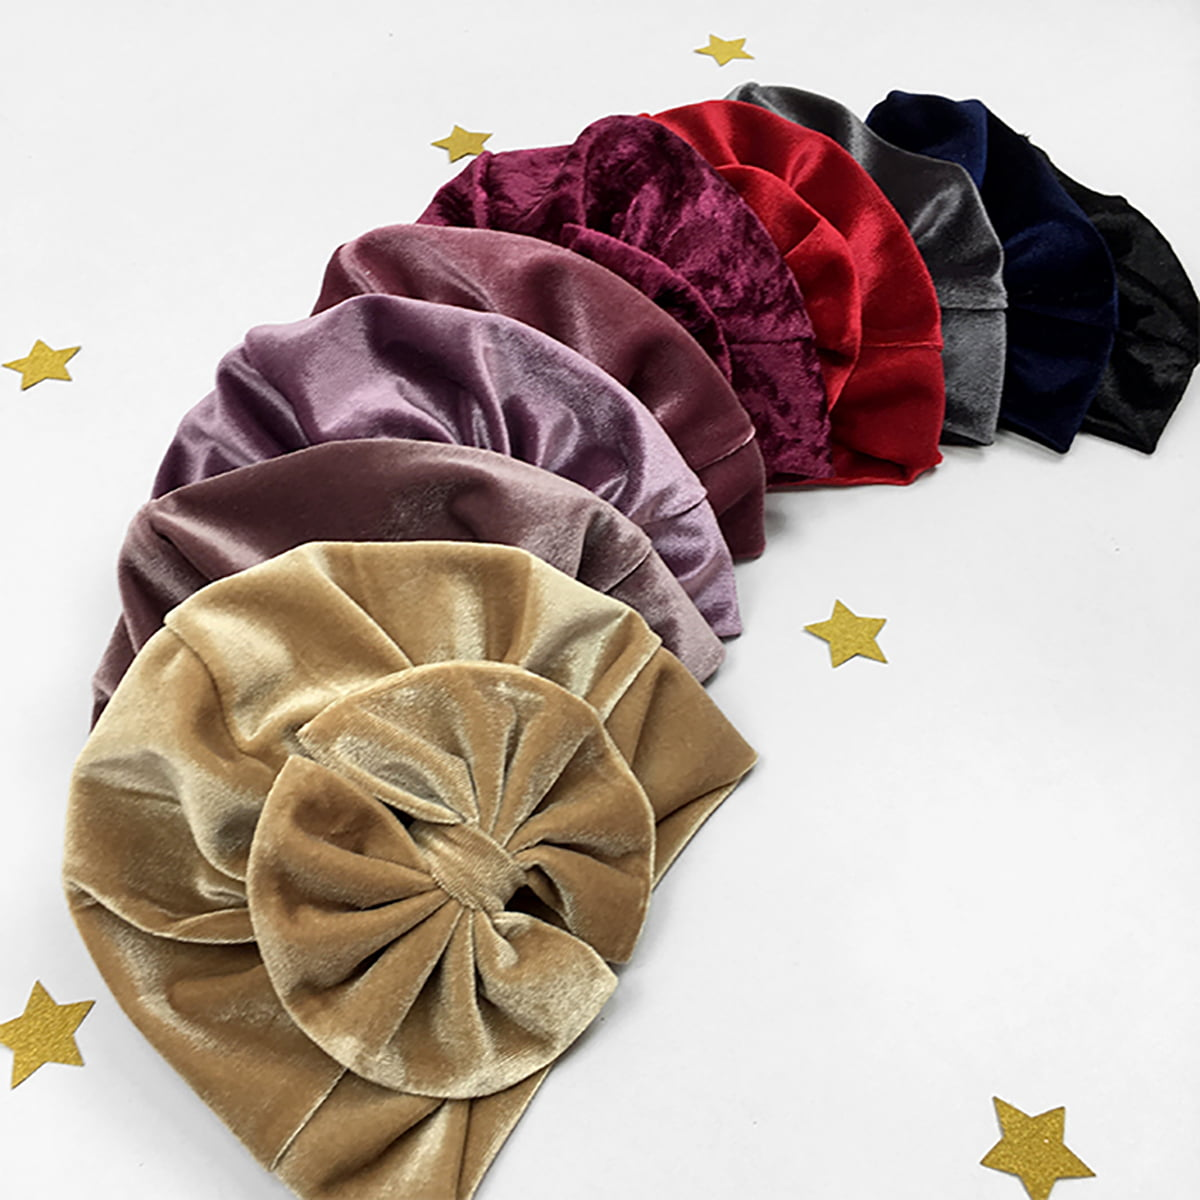 plišani turbani u raznim bojama